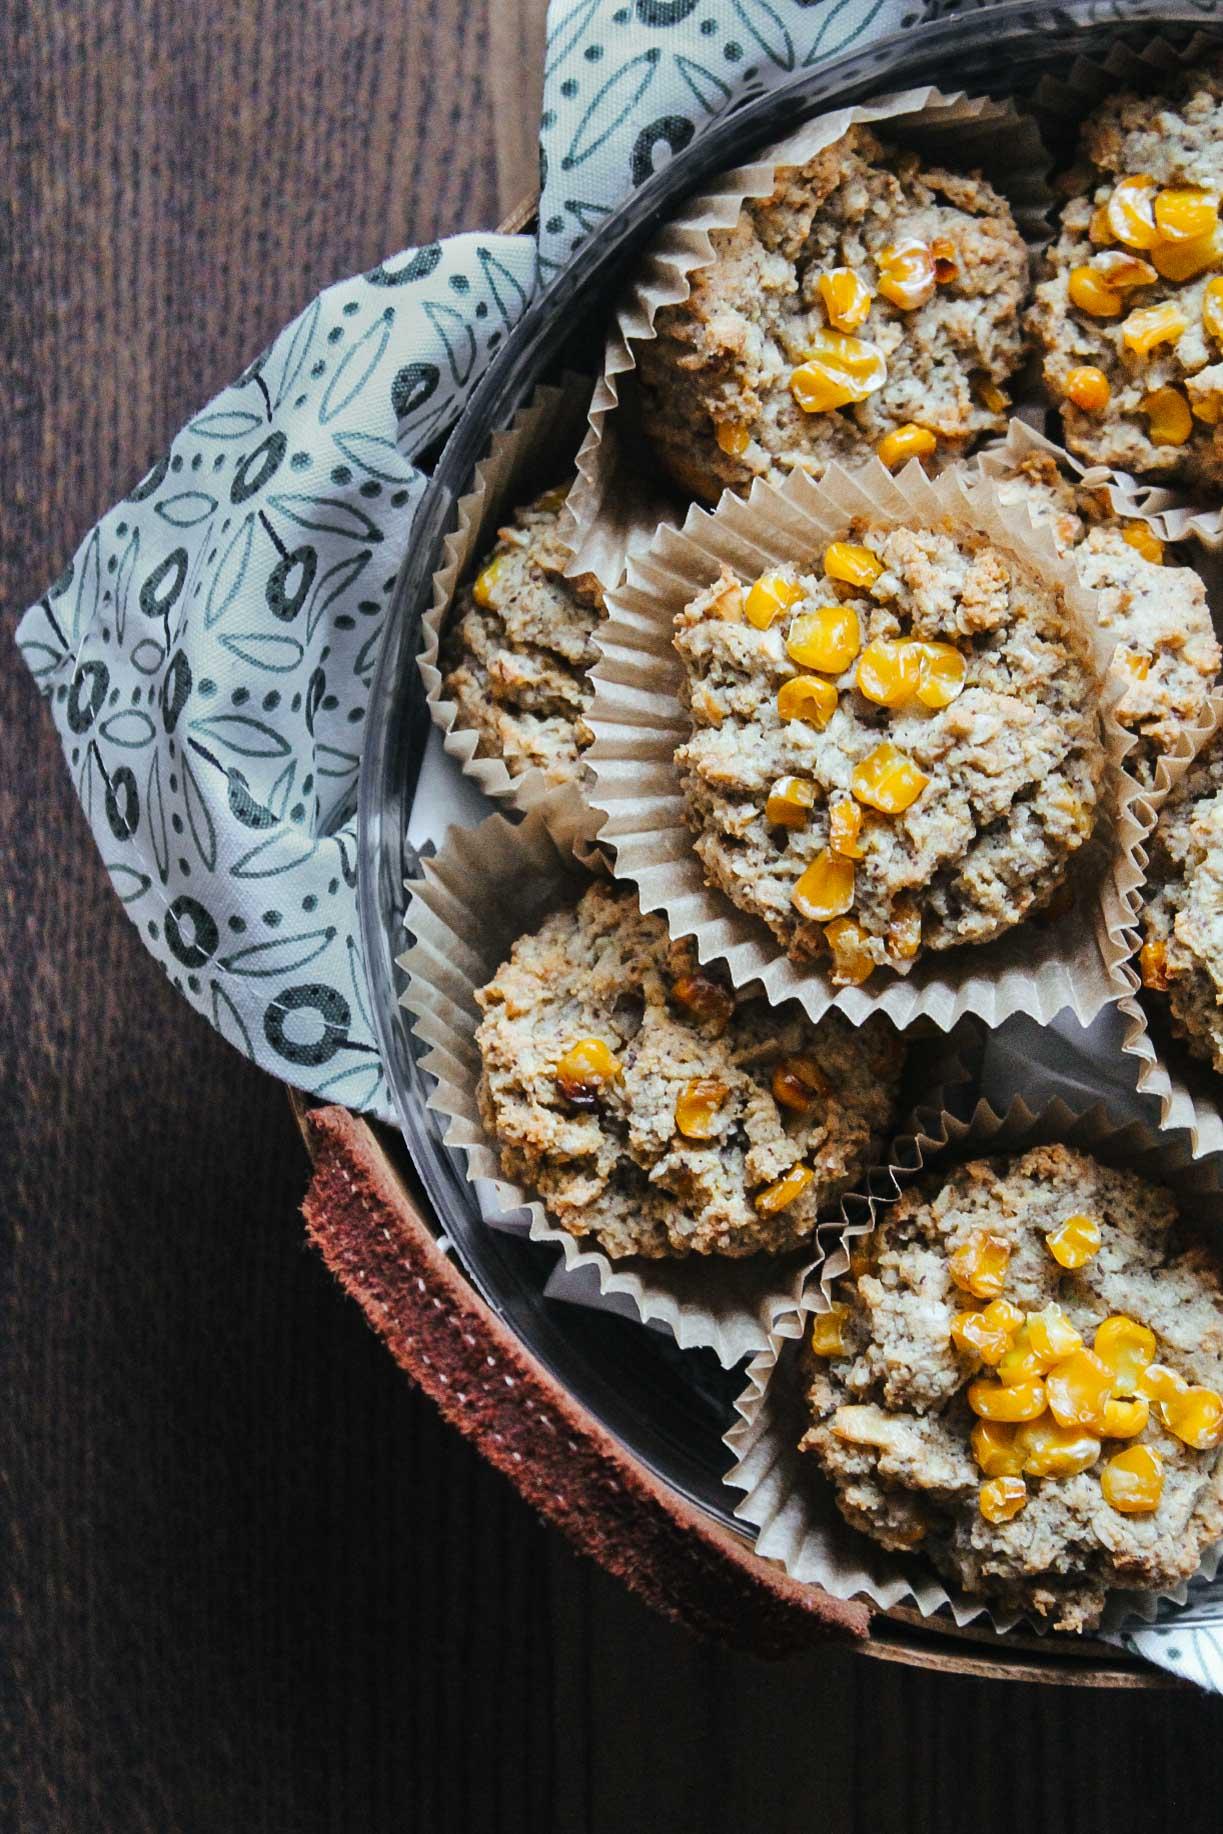 Gluten-Free Cornbread Muffins #gluten-free #vegan #plant-based #cornbread #corn #southern #muffins #recipe #wfpb #wfpbno #Fall #tailgating #thanksgiving #mcdougal #recipes #comfort food